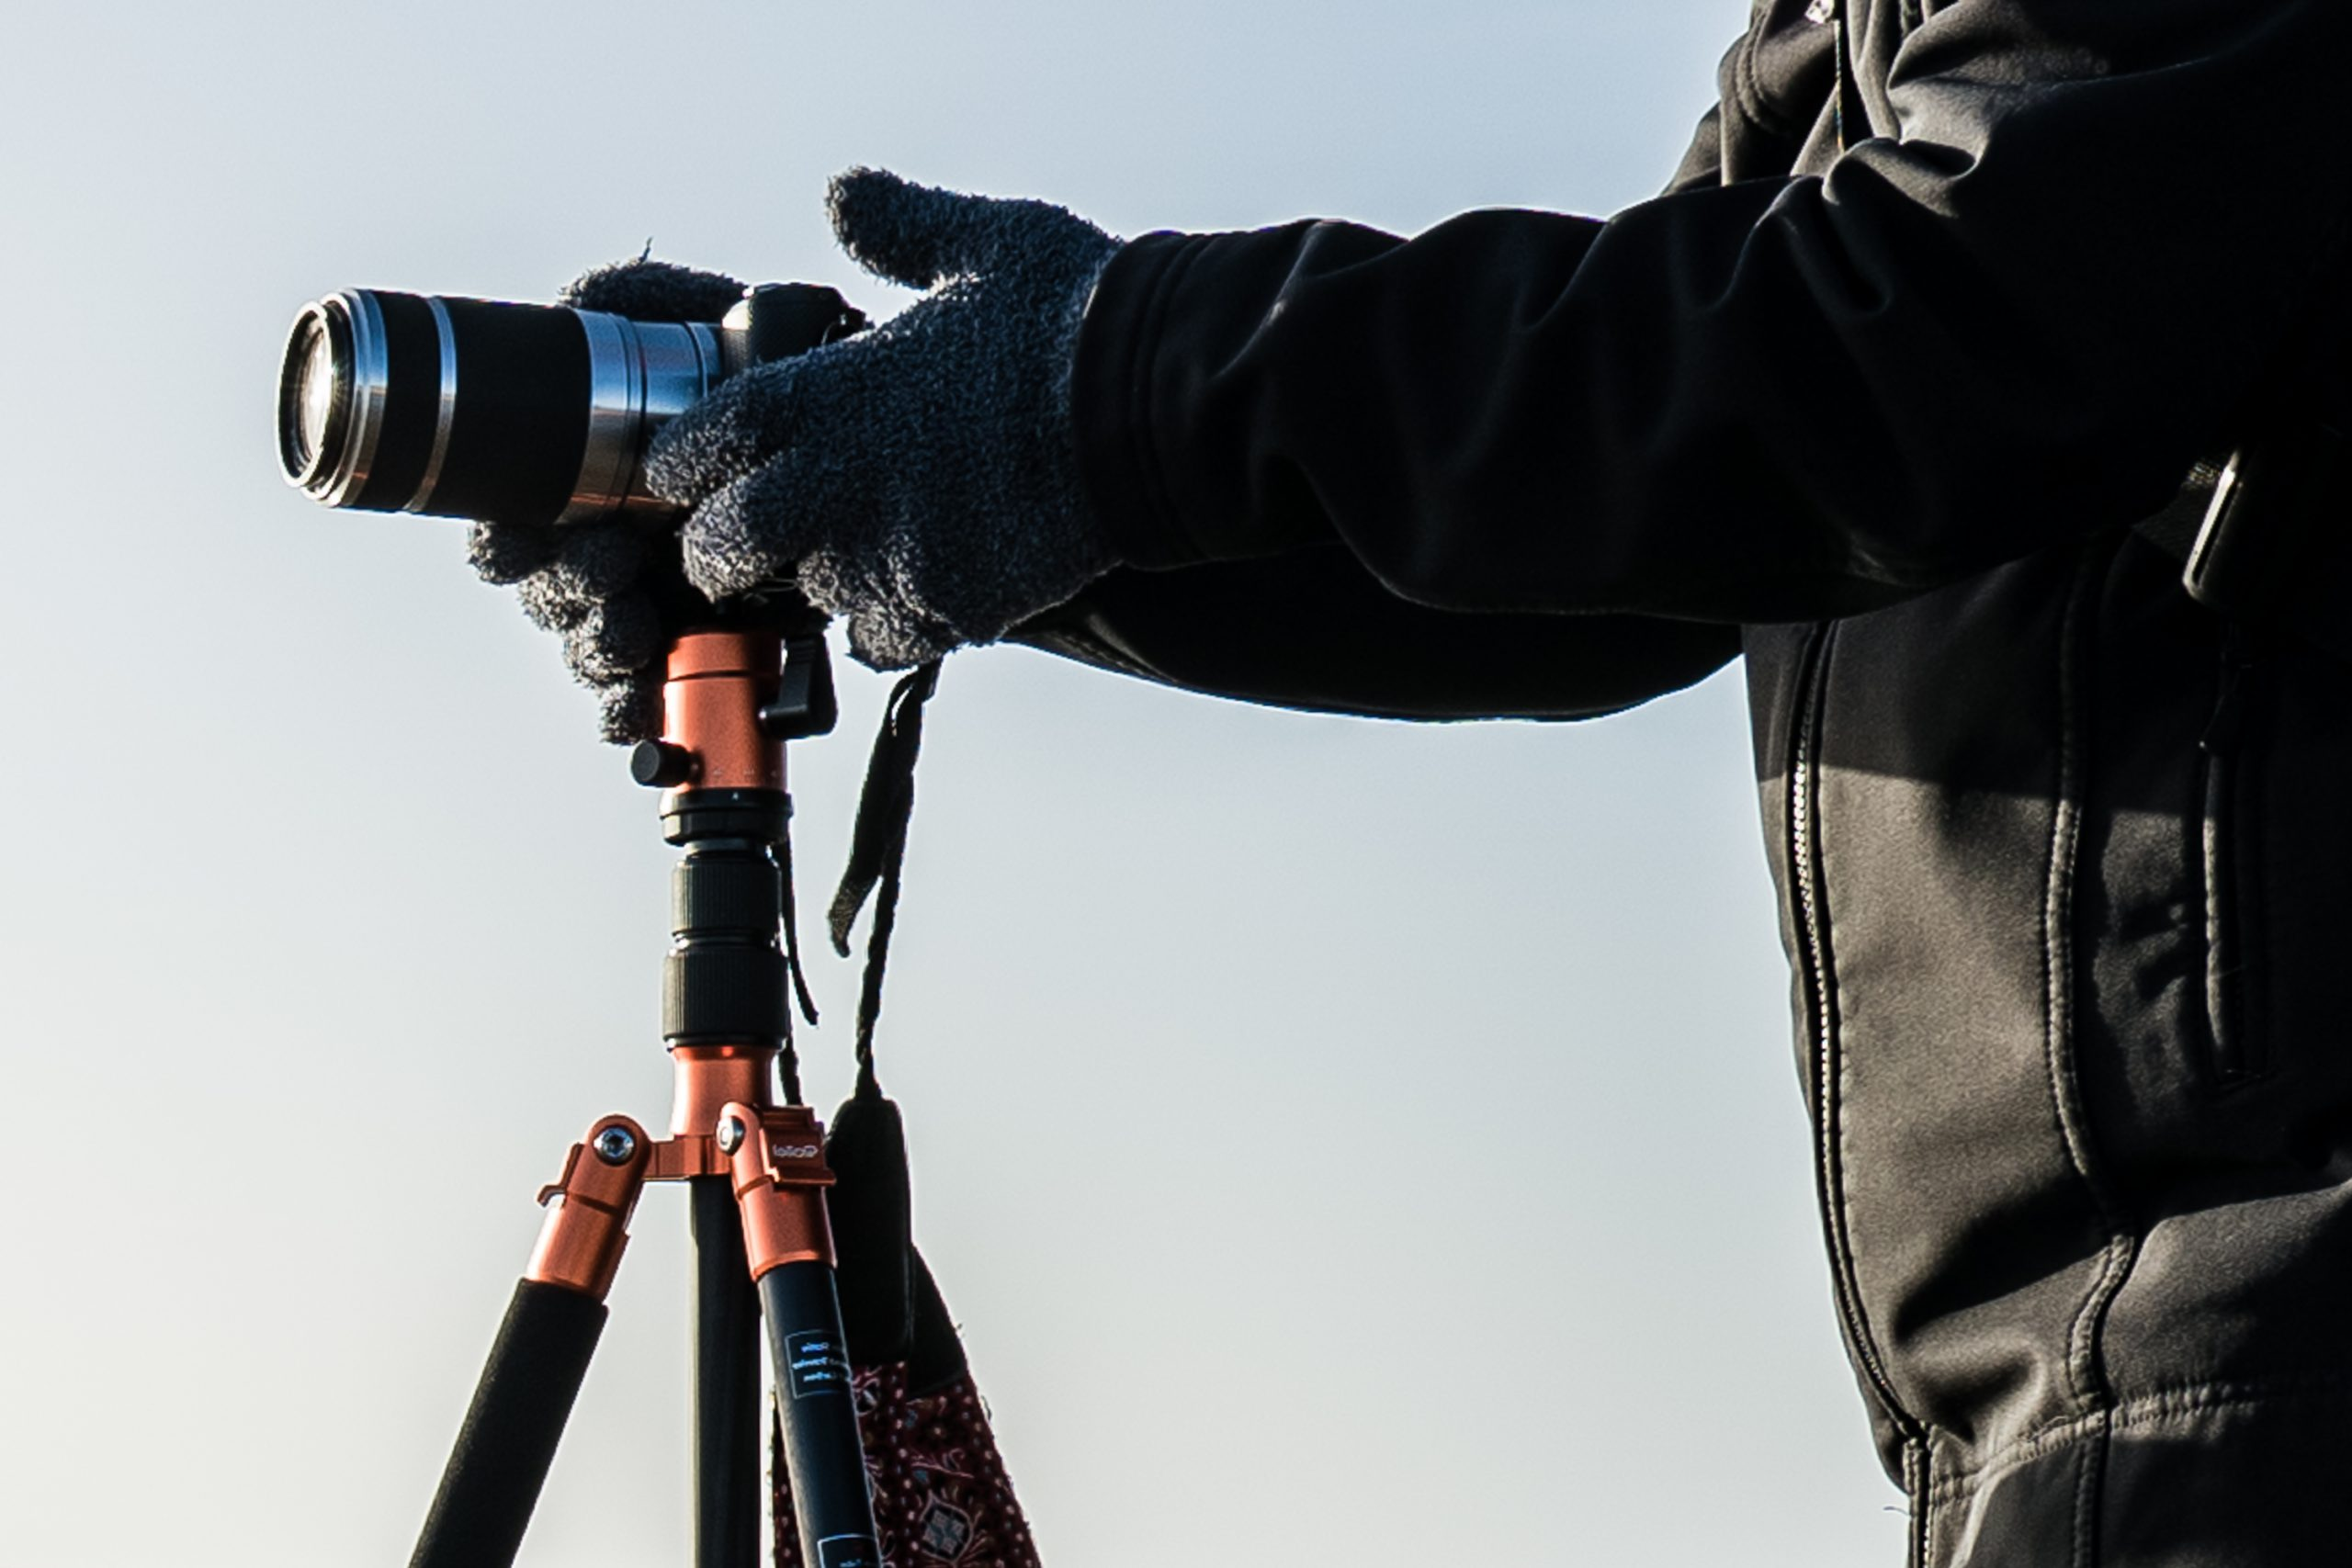 Fotoworkshops 2021 buchbar!